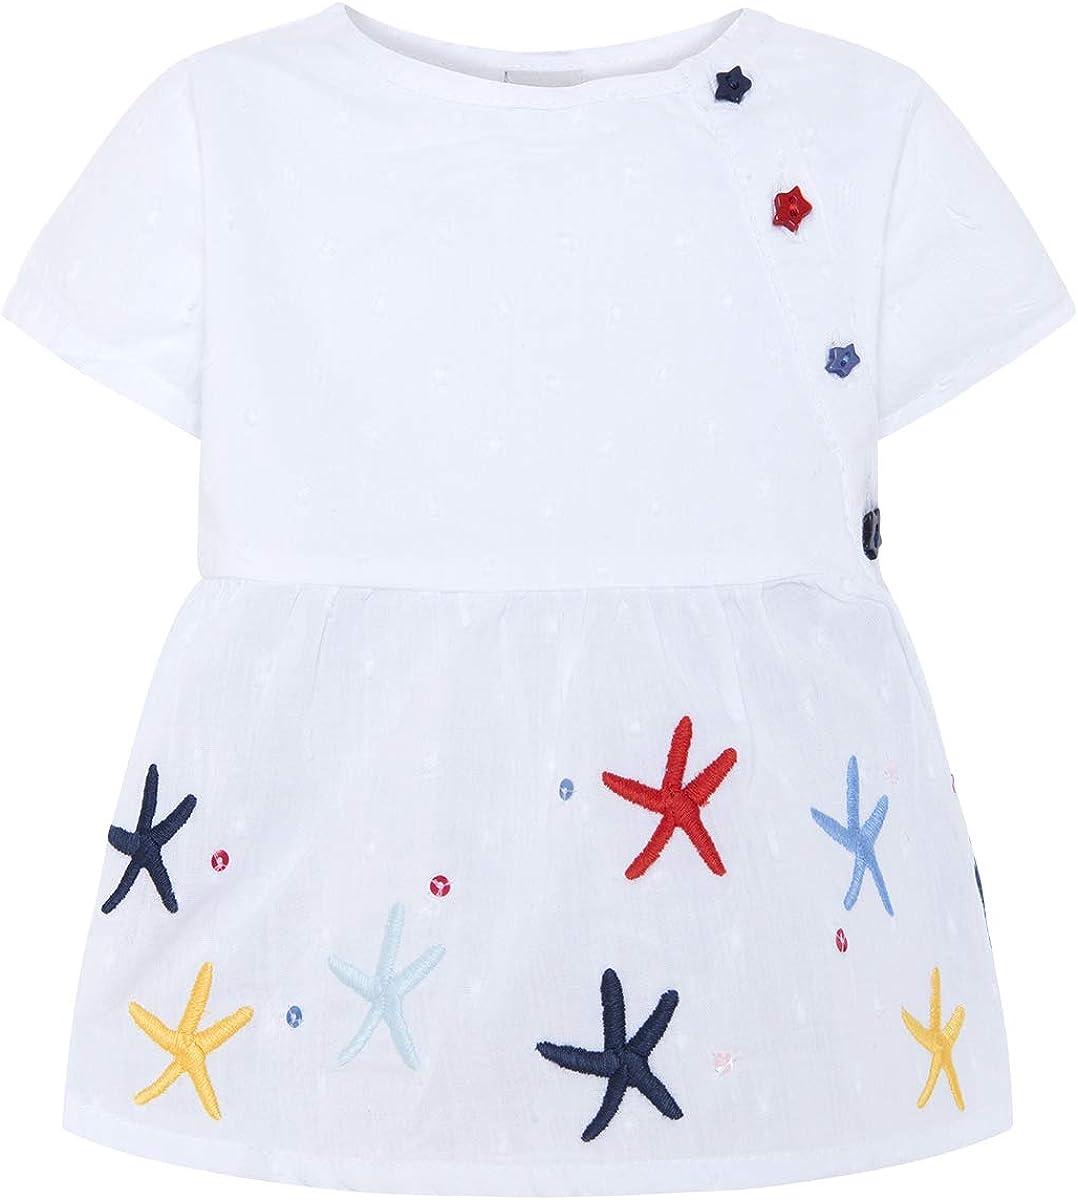 Tuc Tuc Camisa Popelín Niña Arrecife de Coral Camiseta para Bebés